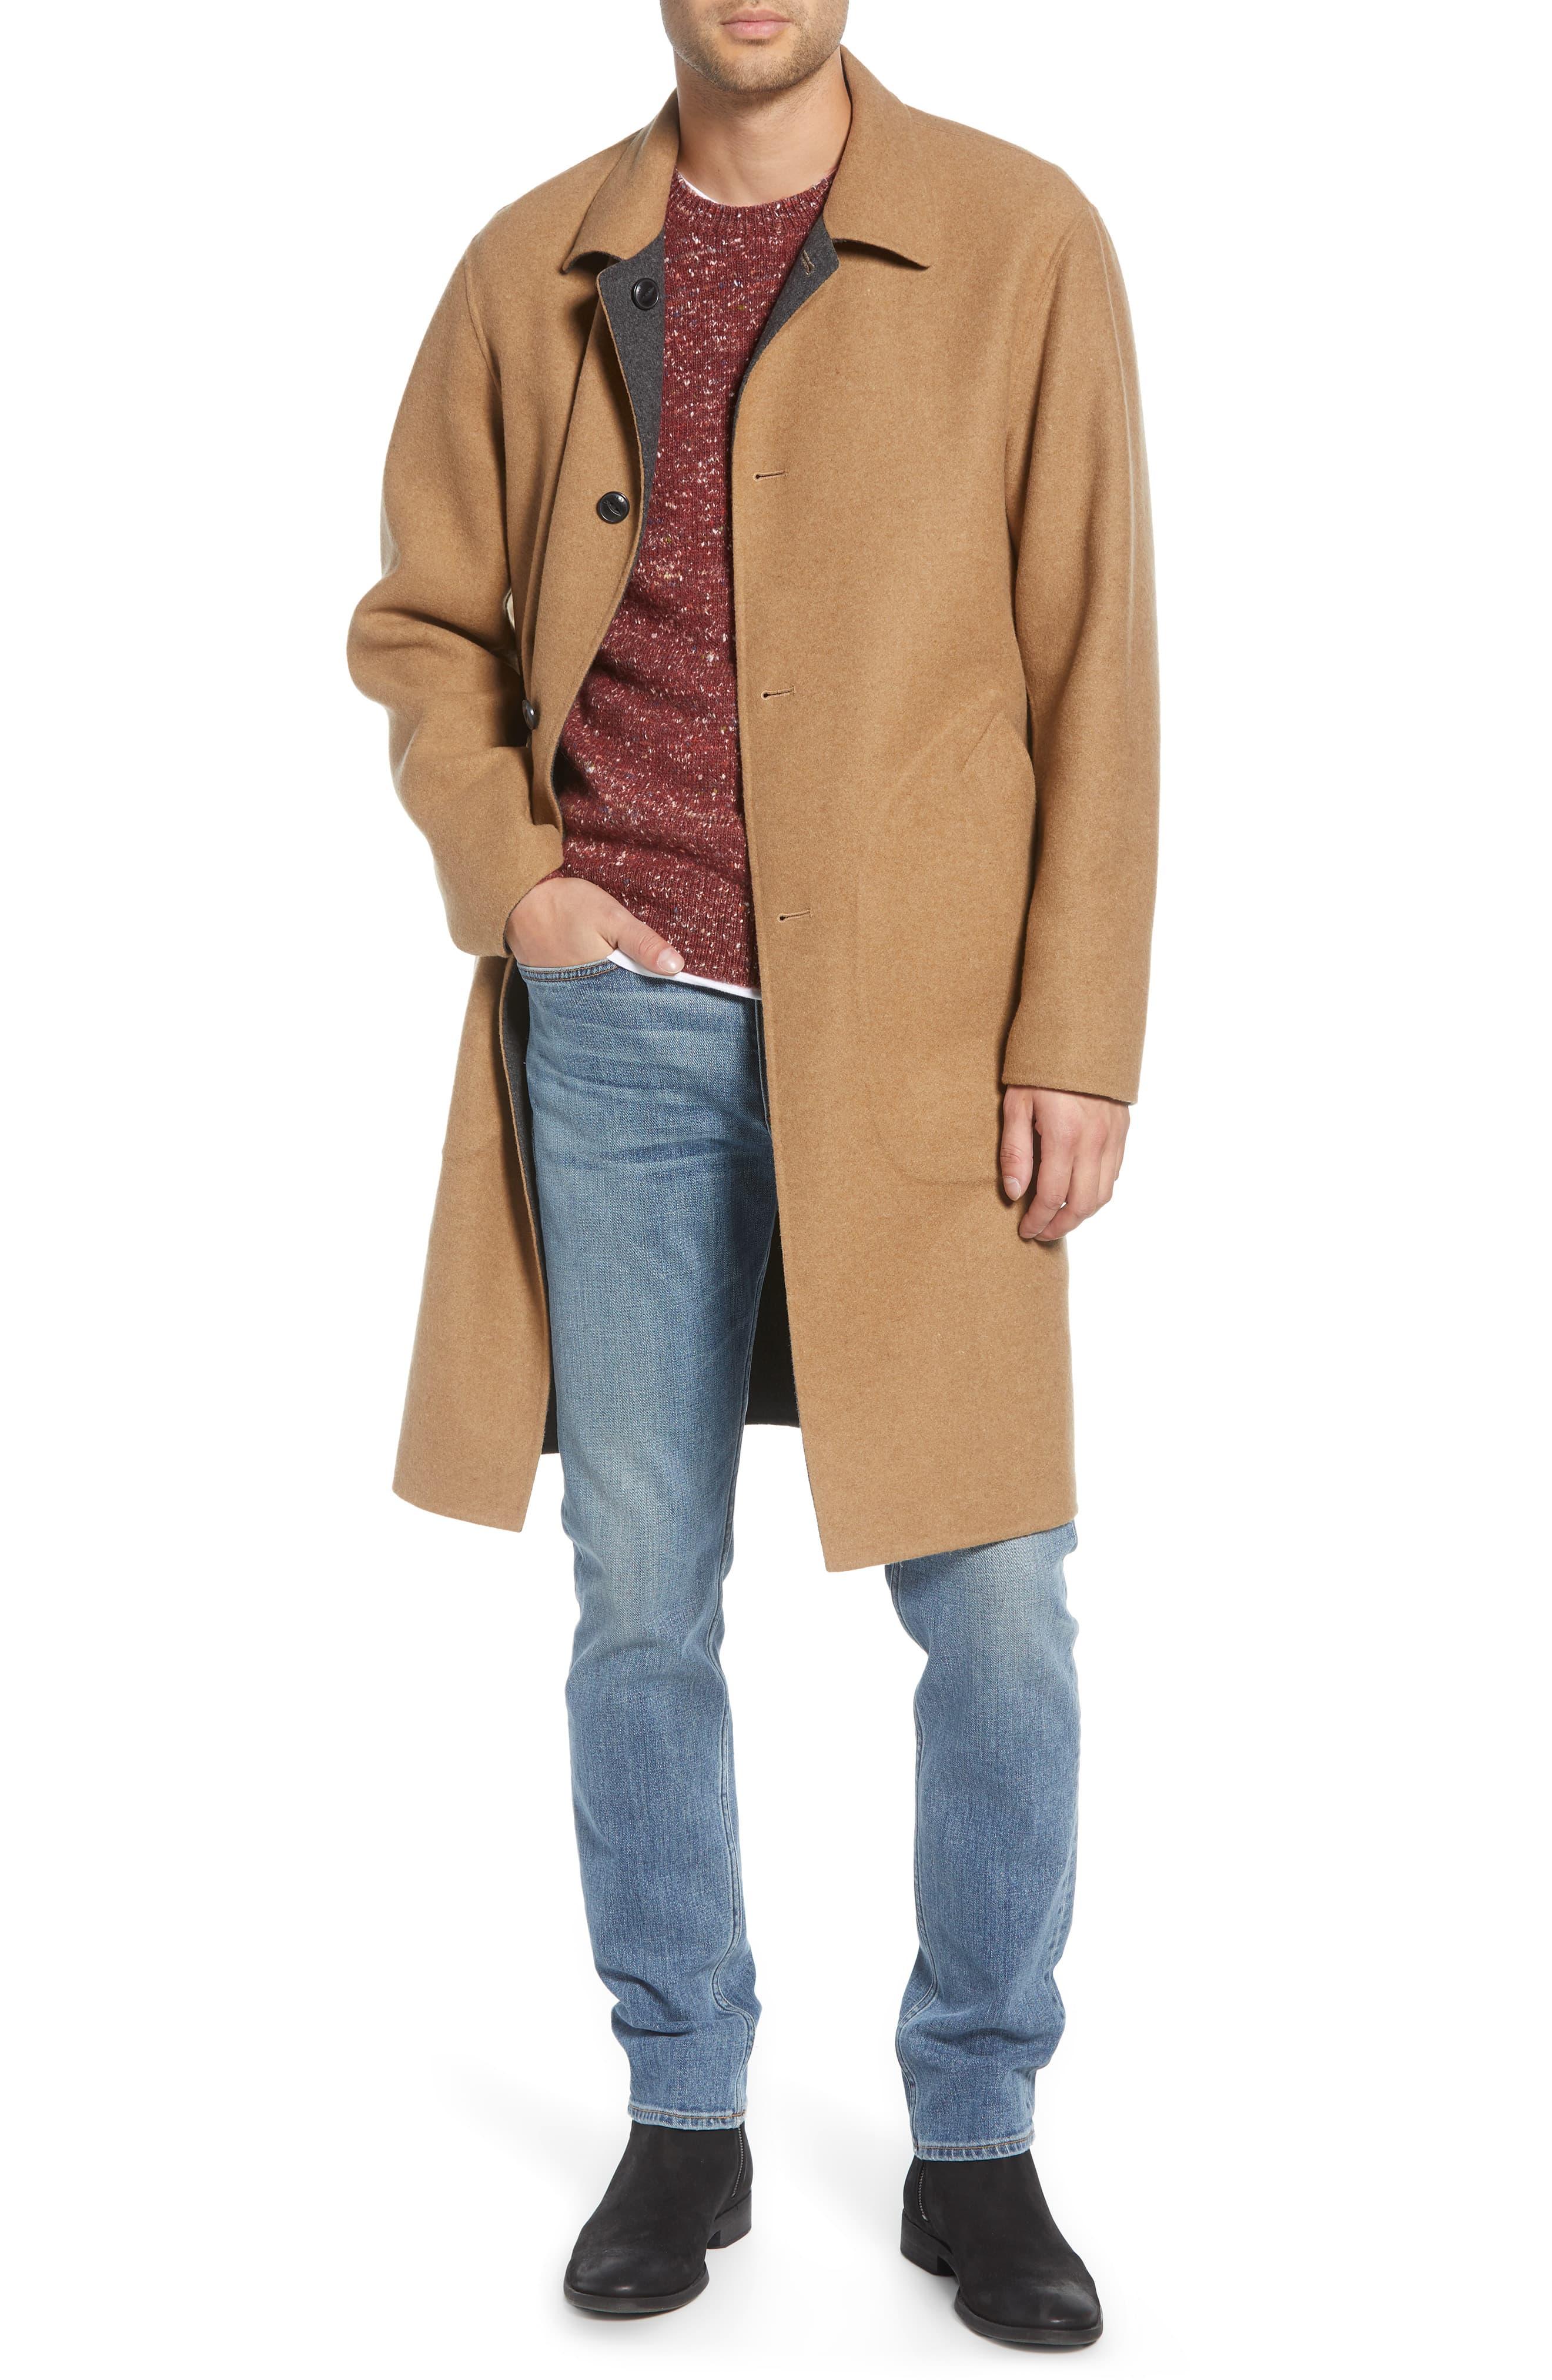 Men's Rag & Bone Brent Reversible Wool Blend Coat, Size Small - Beige